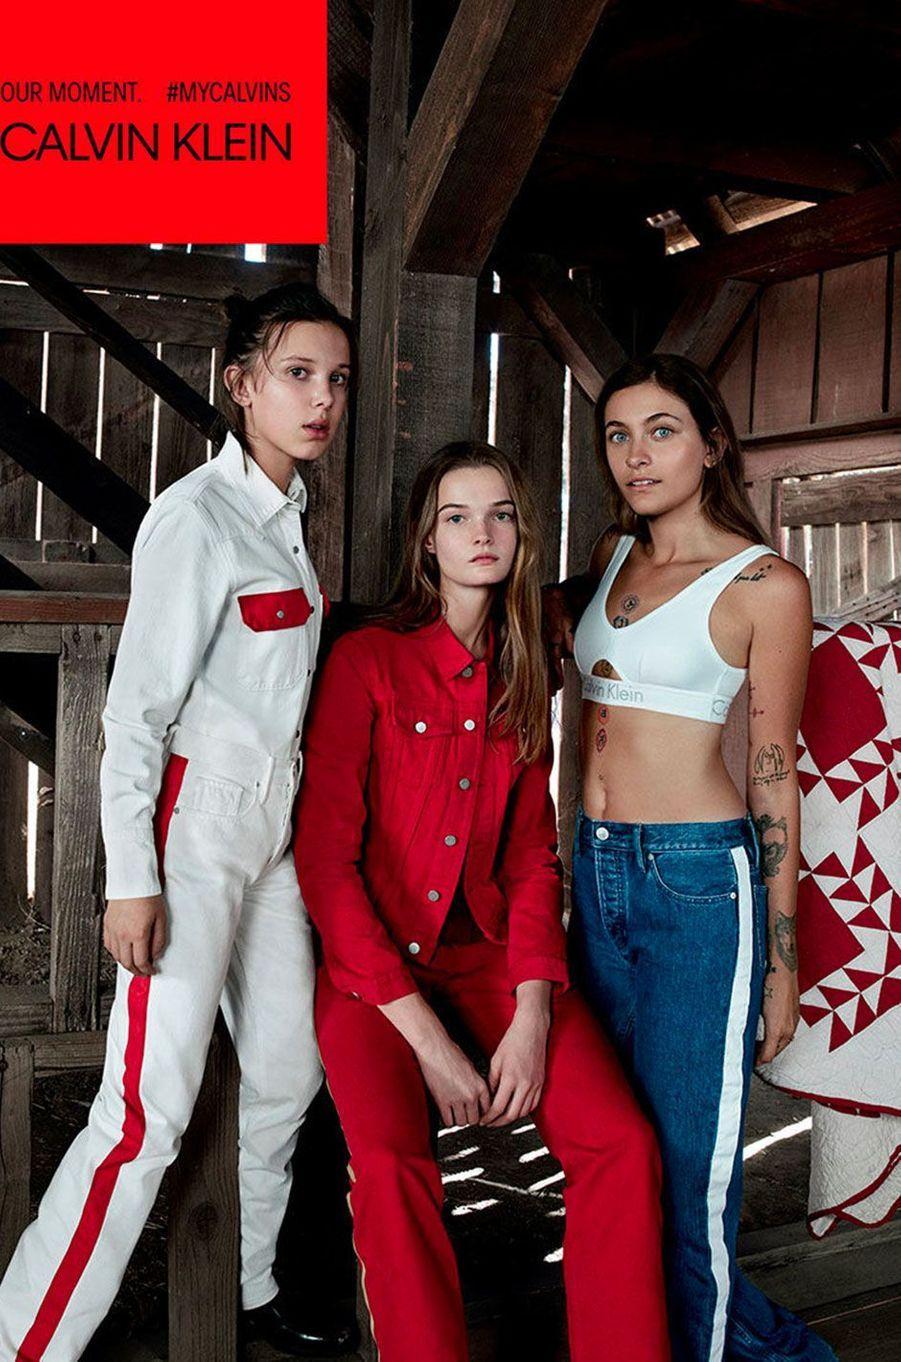 Millie Bobby Brown, Paris Jackson et Lulu Tenney pour Calvin Klein